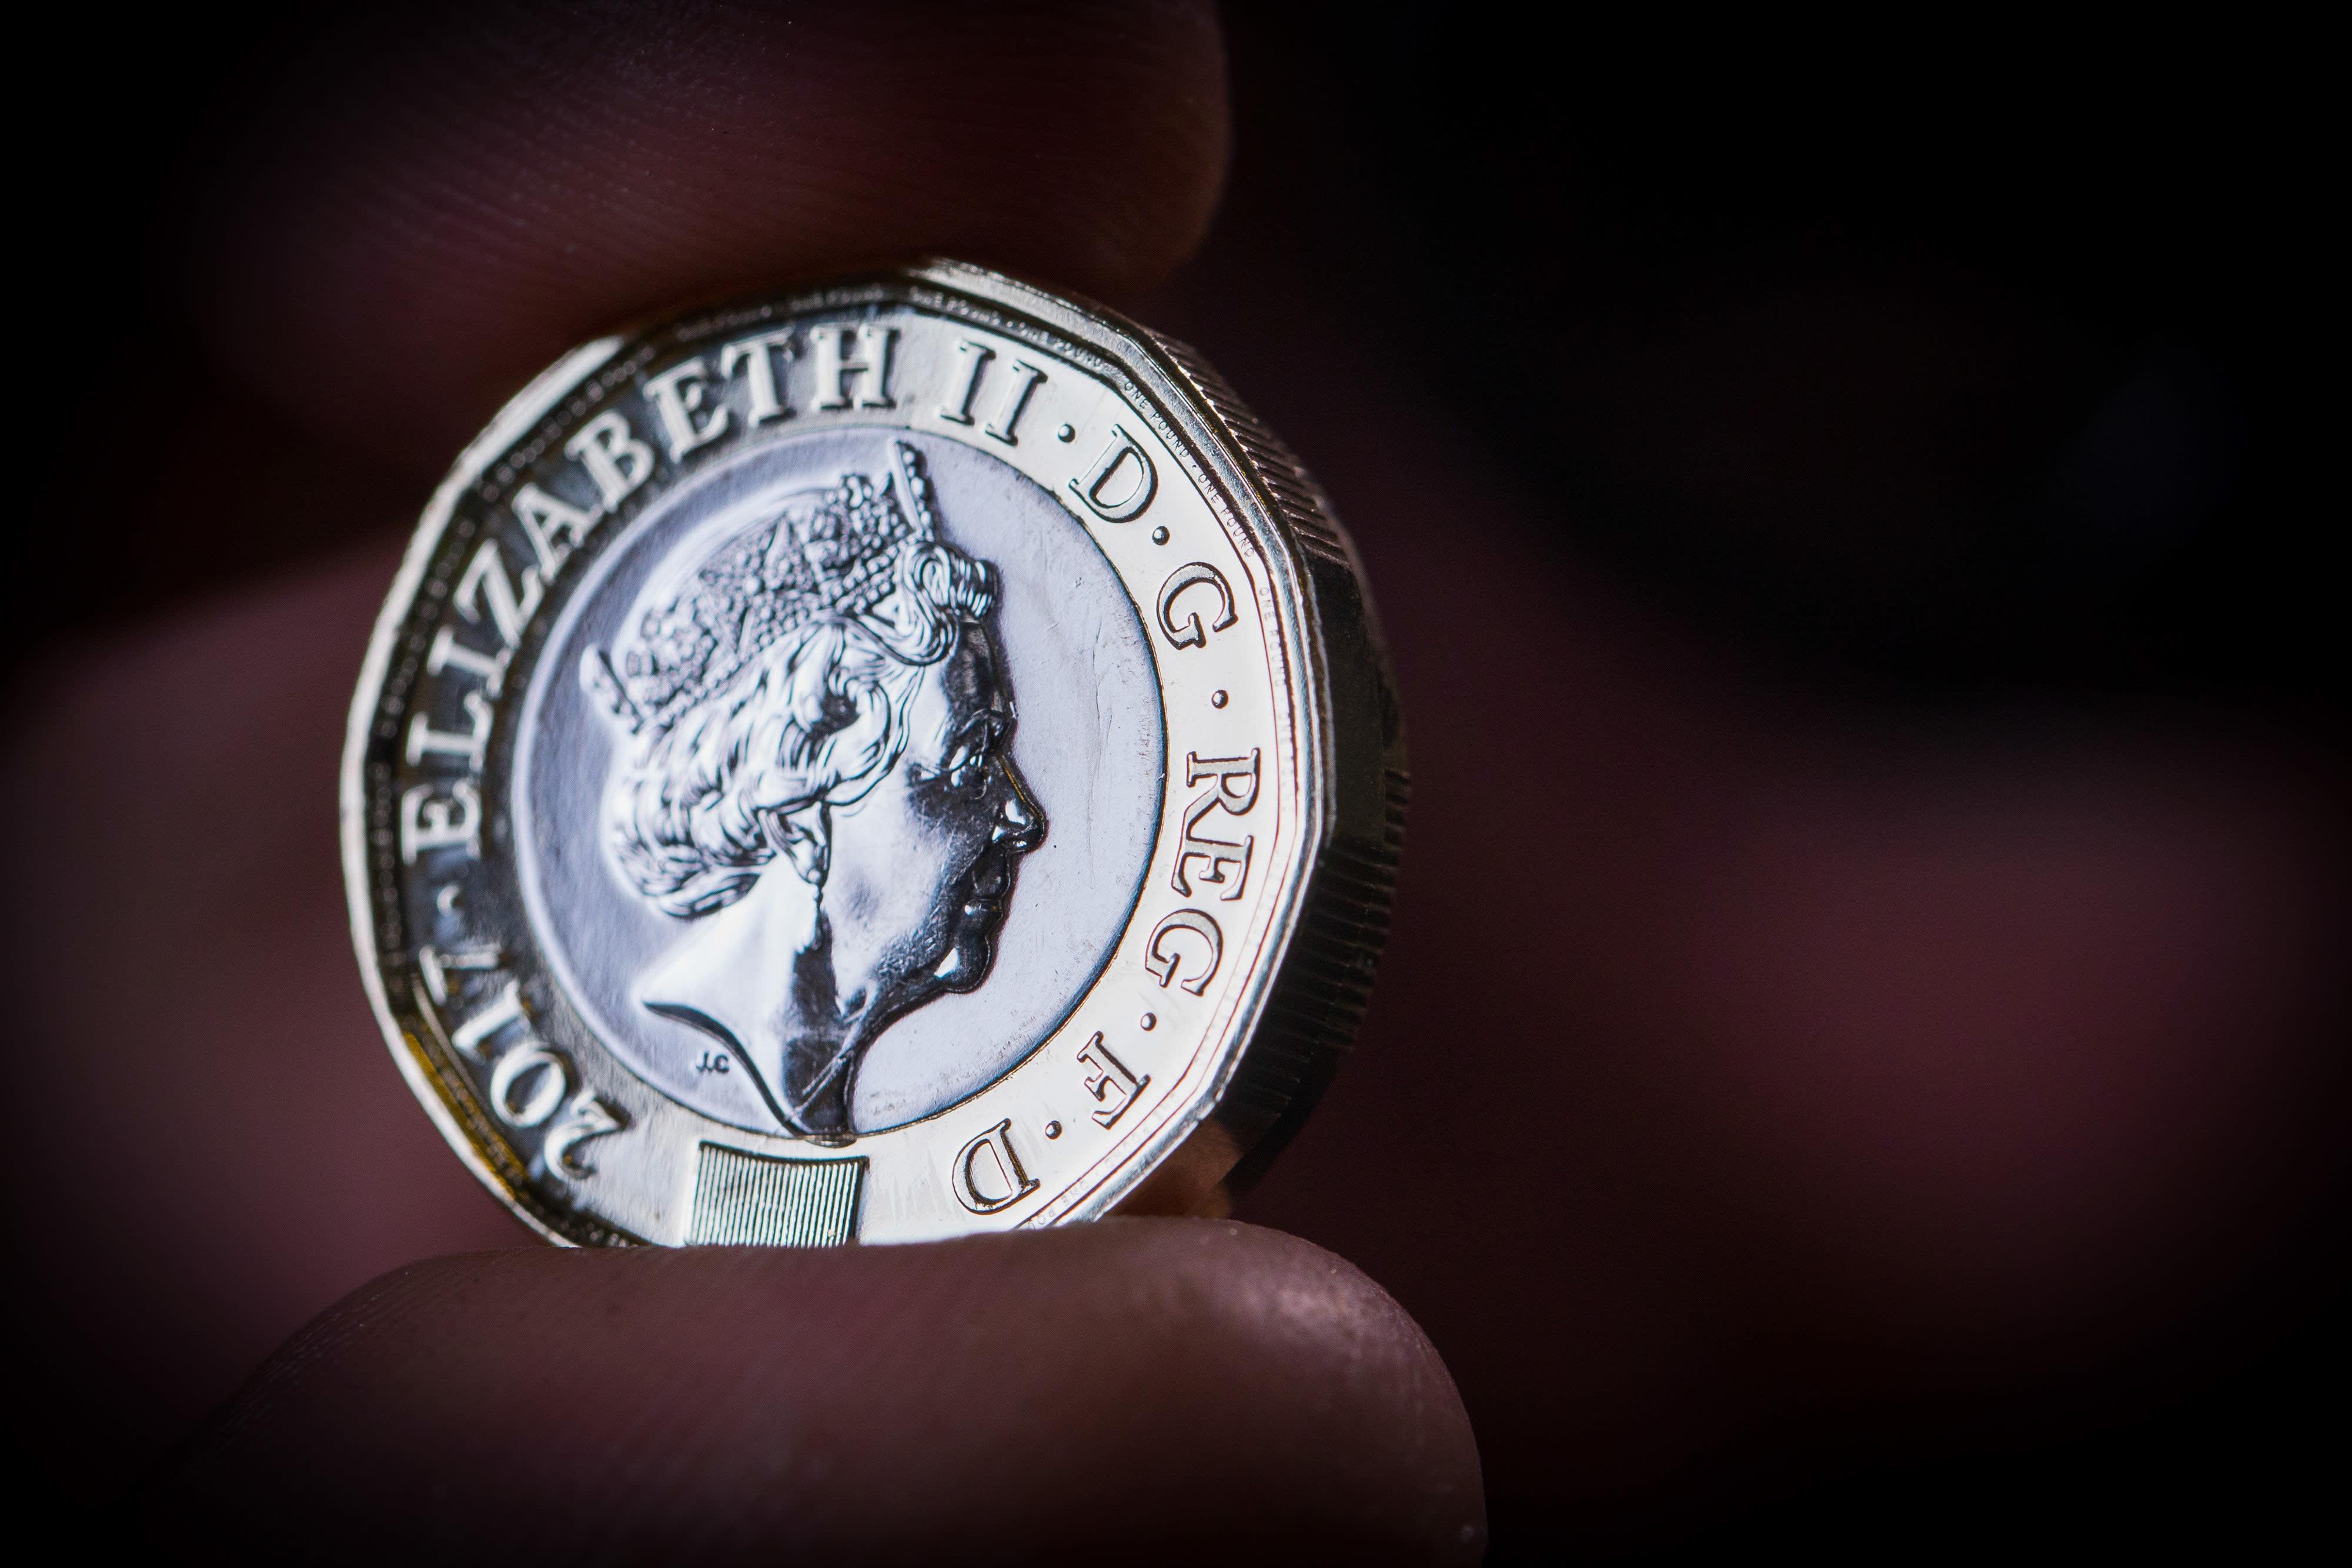 Investors pull £1bn from Merian funds after Jupiter deal